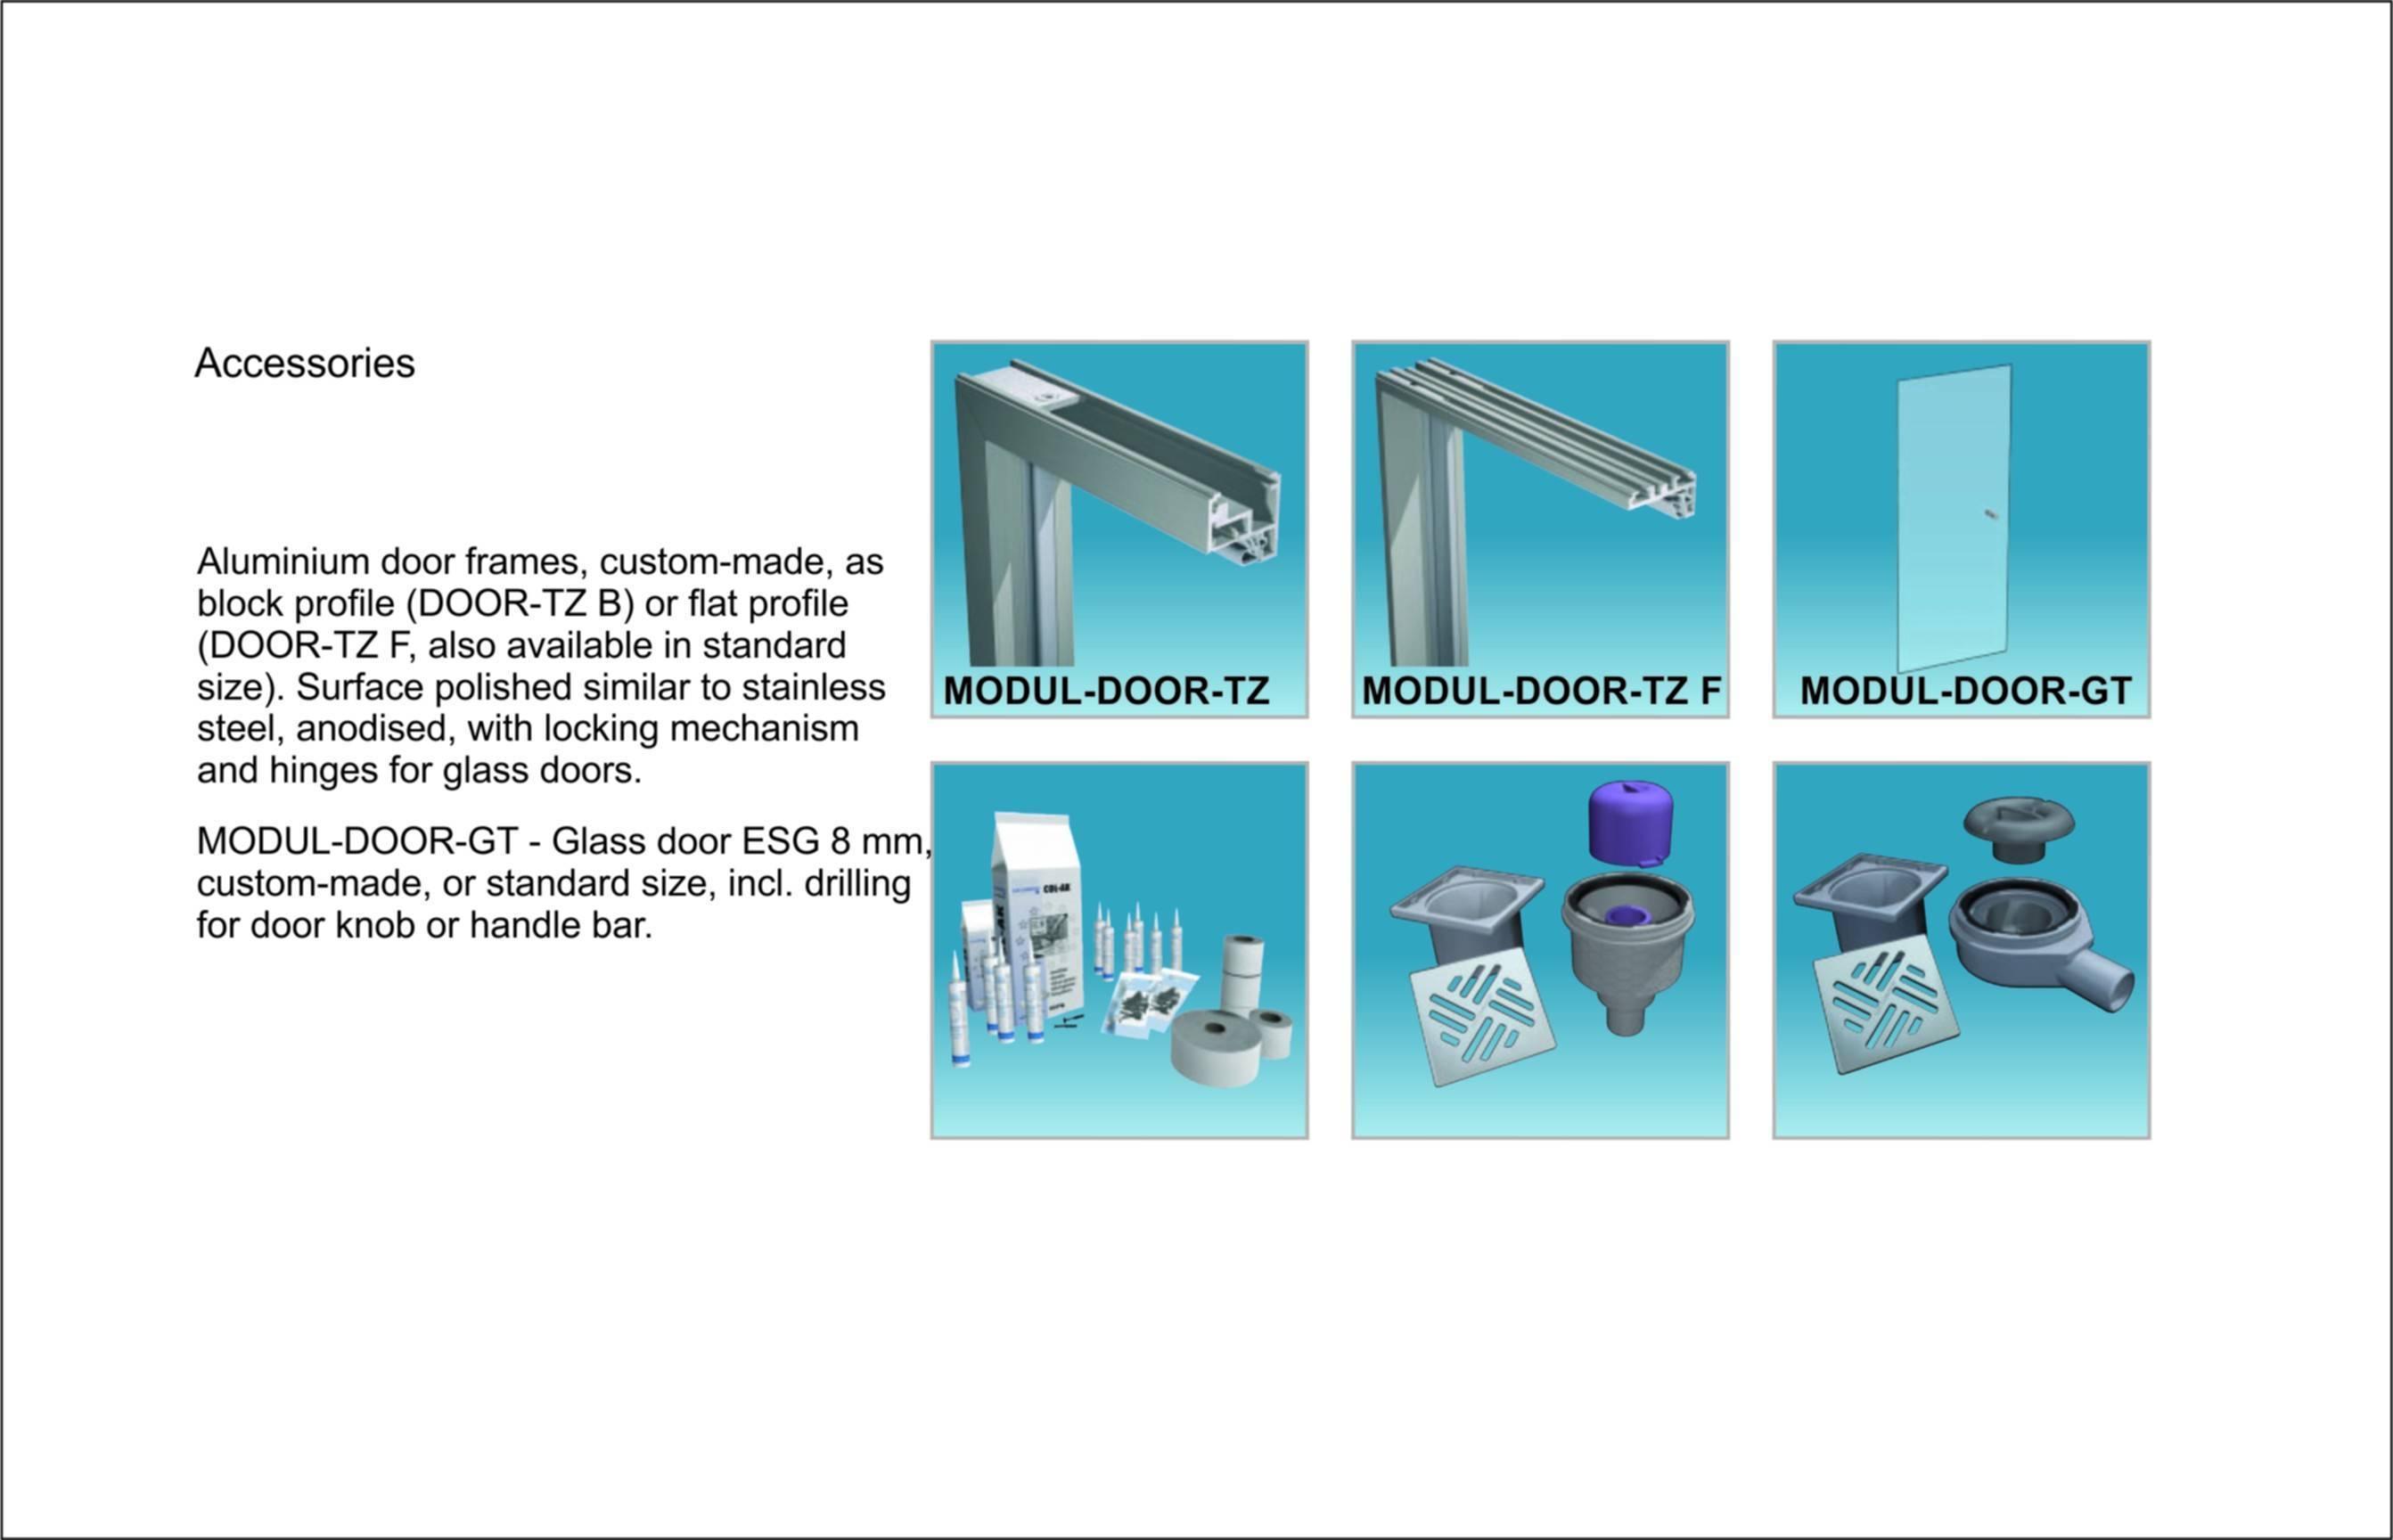 Hamam (tursko kupatilo) LUX-ELEMENTS-MODUL (Parna kupatila/ konstrukcije soba)